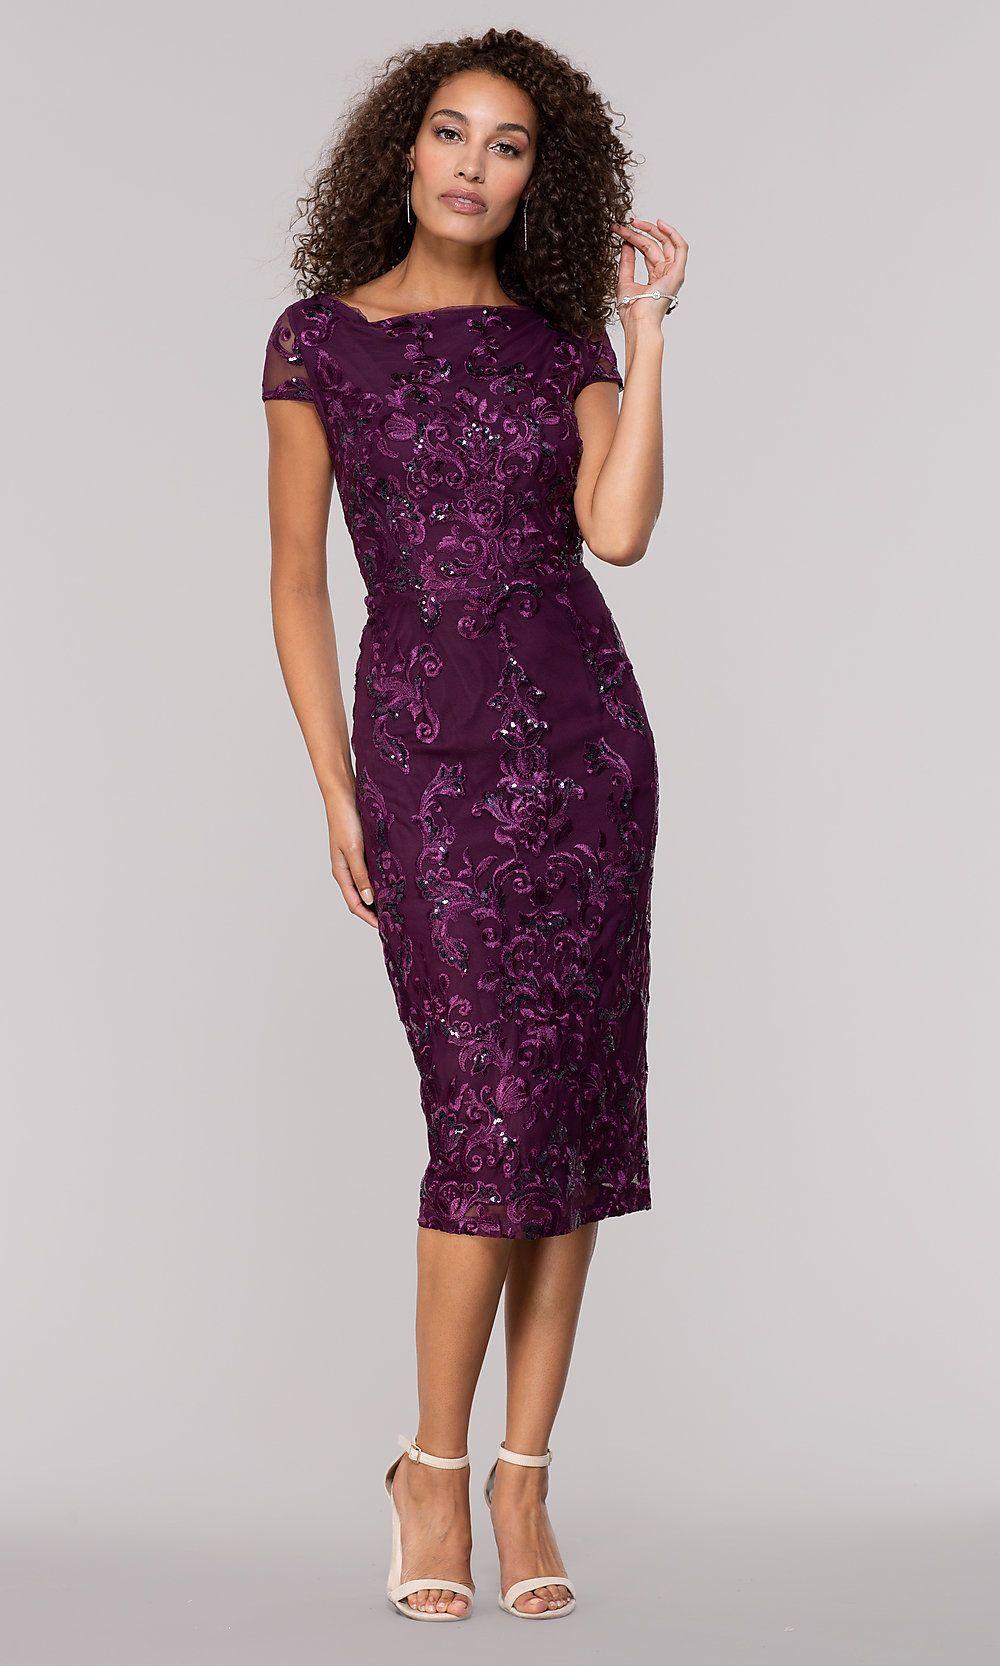 Eggplant Purple Knee Length Wedding Guest Dress In 2020 Purple